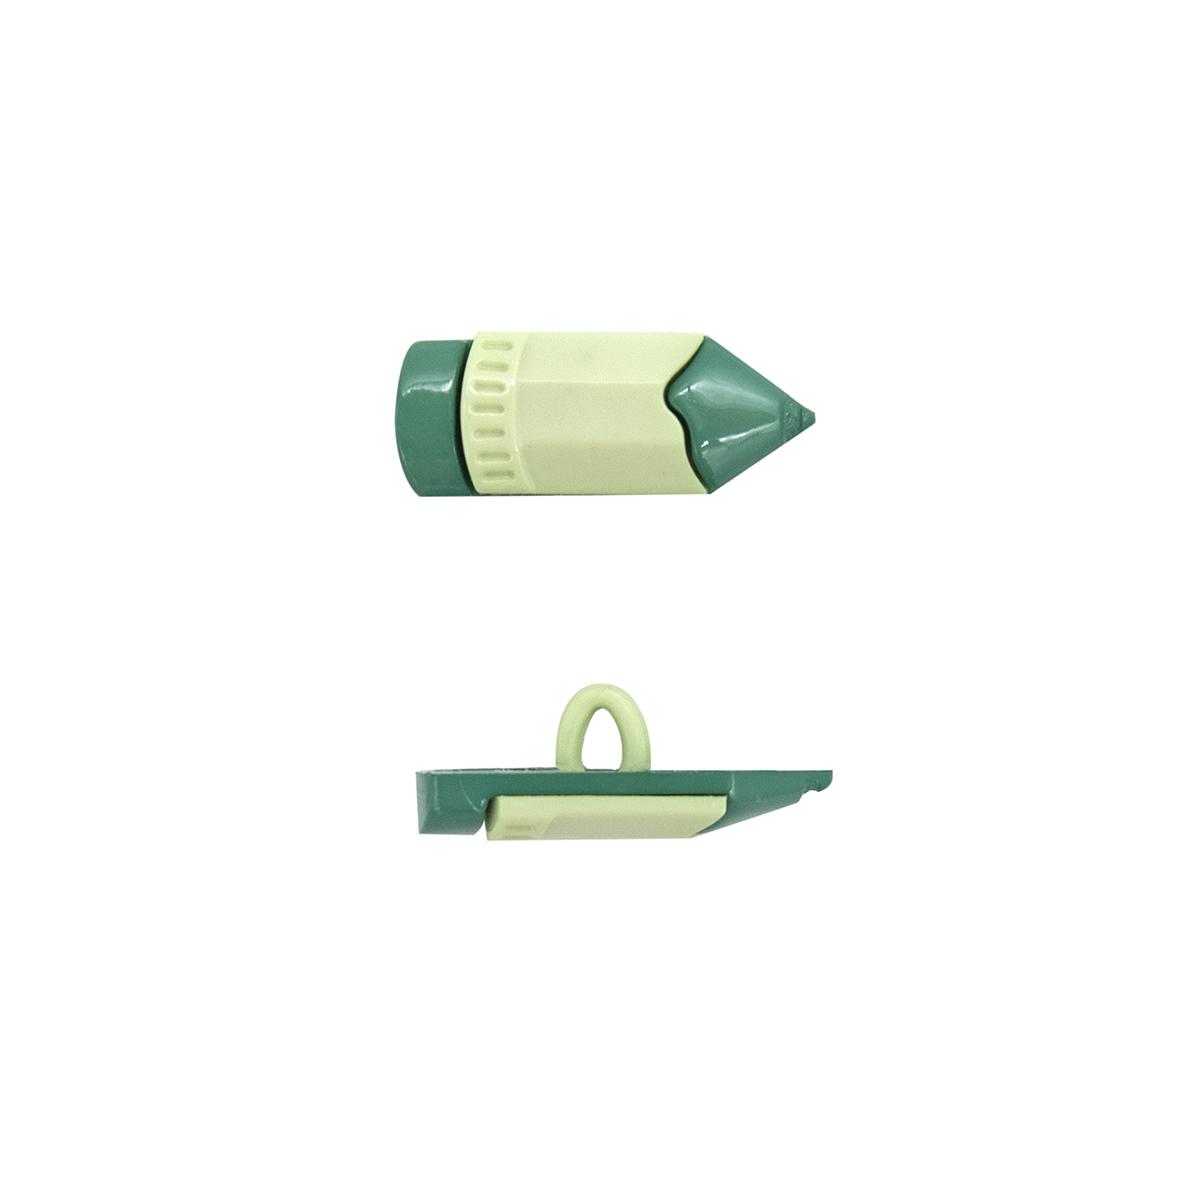 48790 Пуговица 'Карандаш', 25 мм